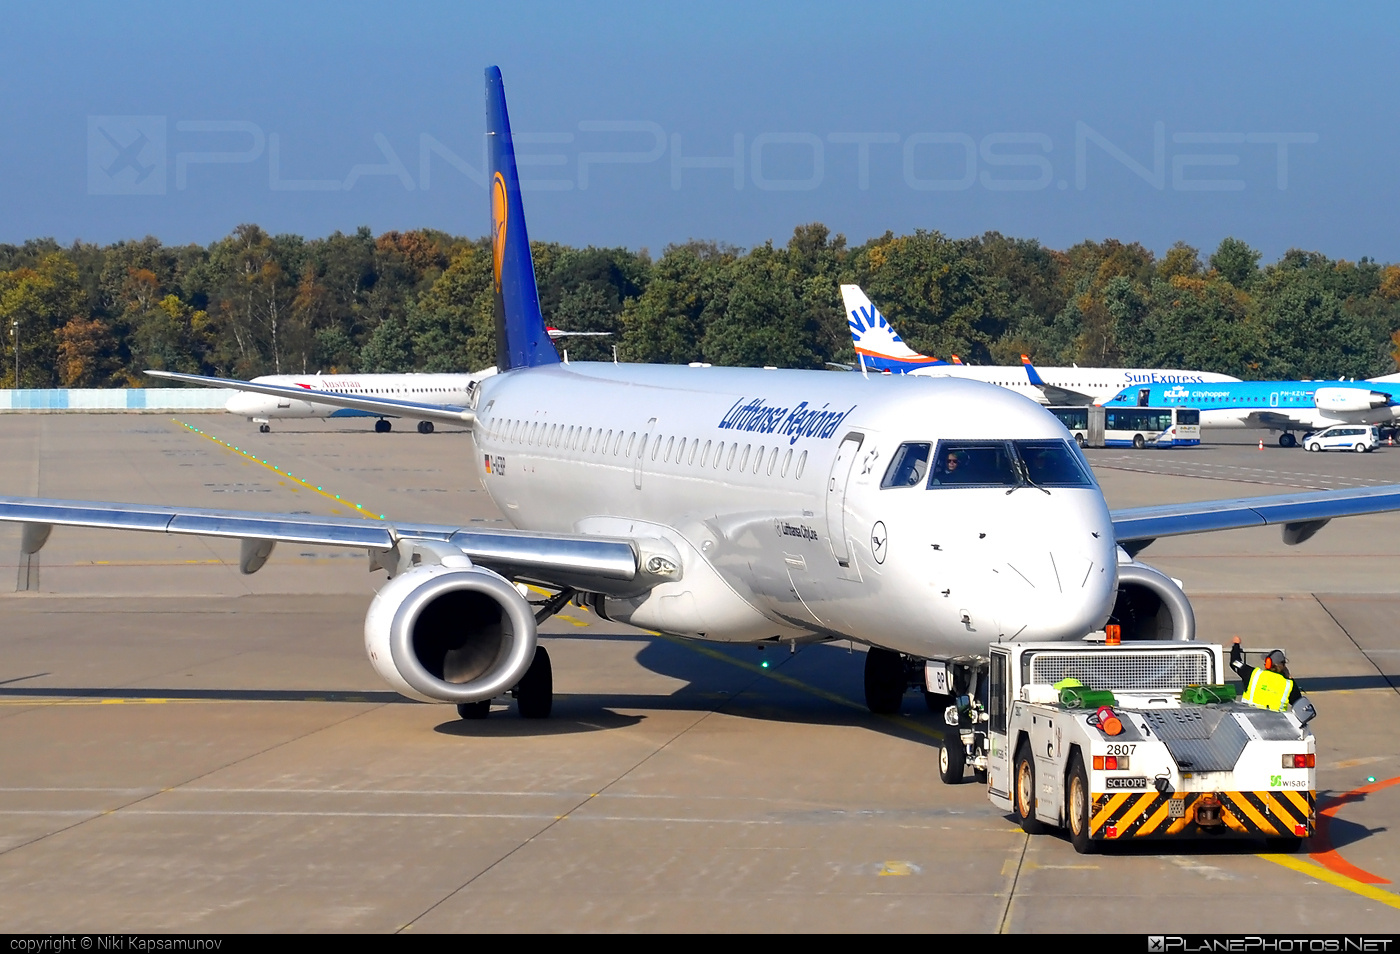 Embraer E195LR (ERJ-190-200LR) - D-AEBP operated by Lufthansa Regional (CityLine) #e190 #e190200 #e190200lr #e195lr #embraer #embraer190200lr #embraer195 #embraer195lr